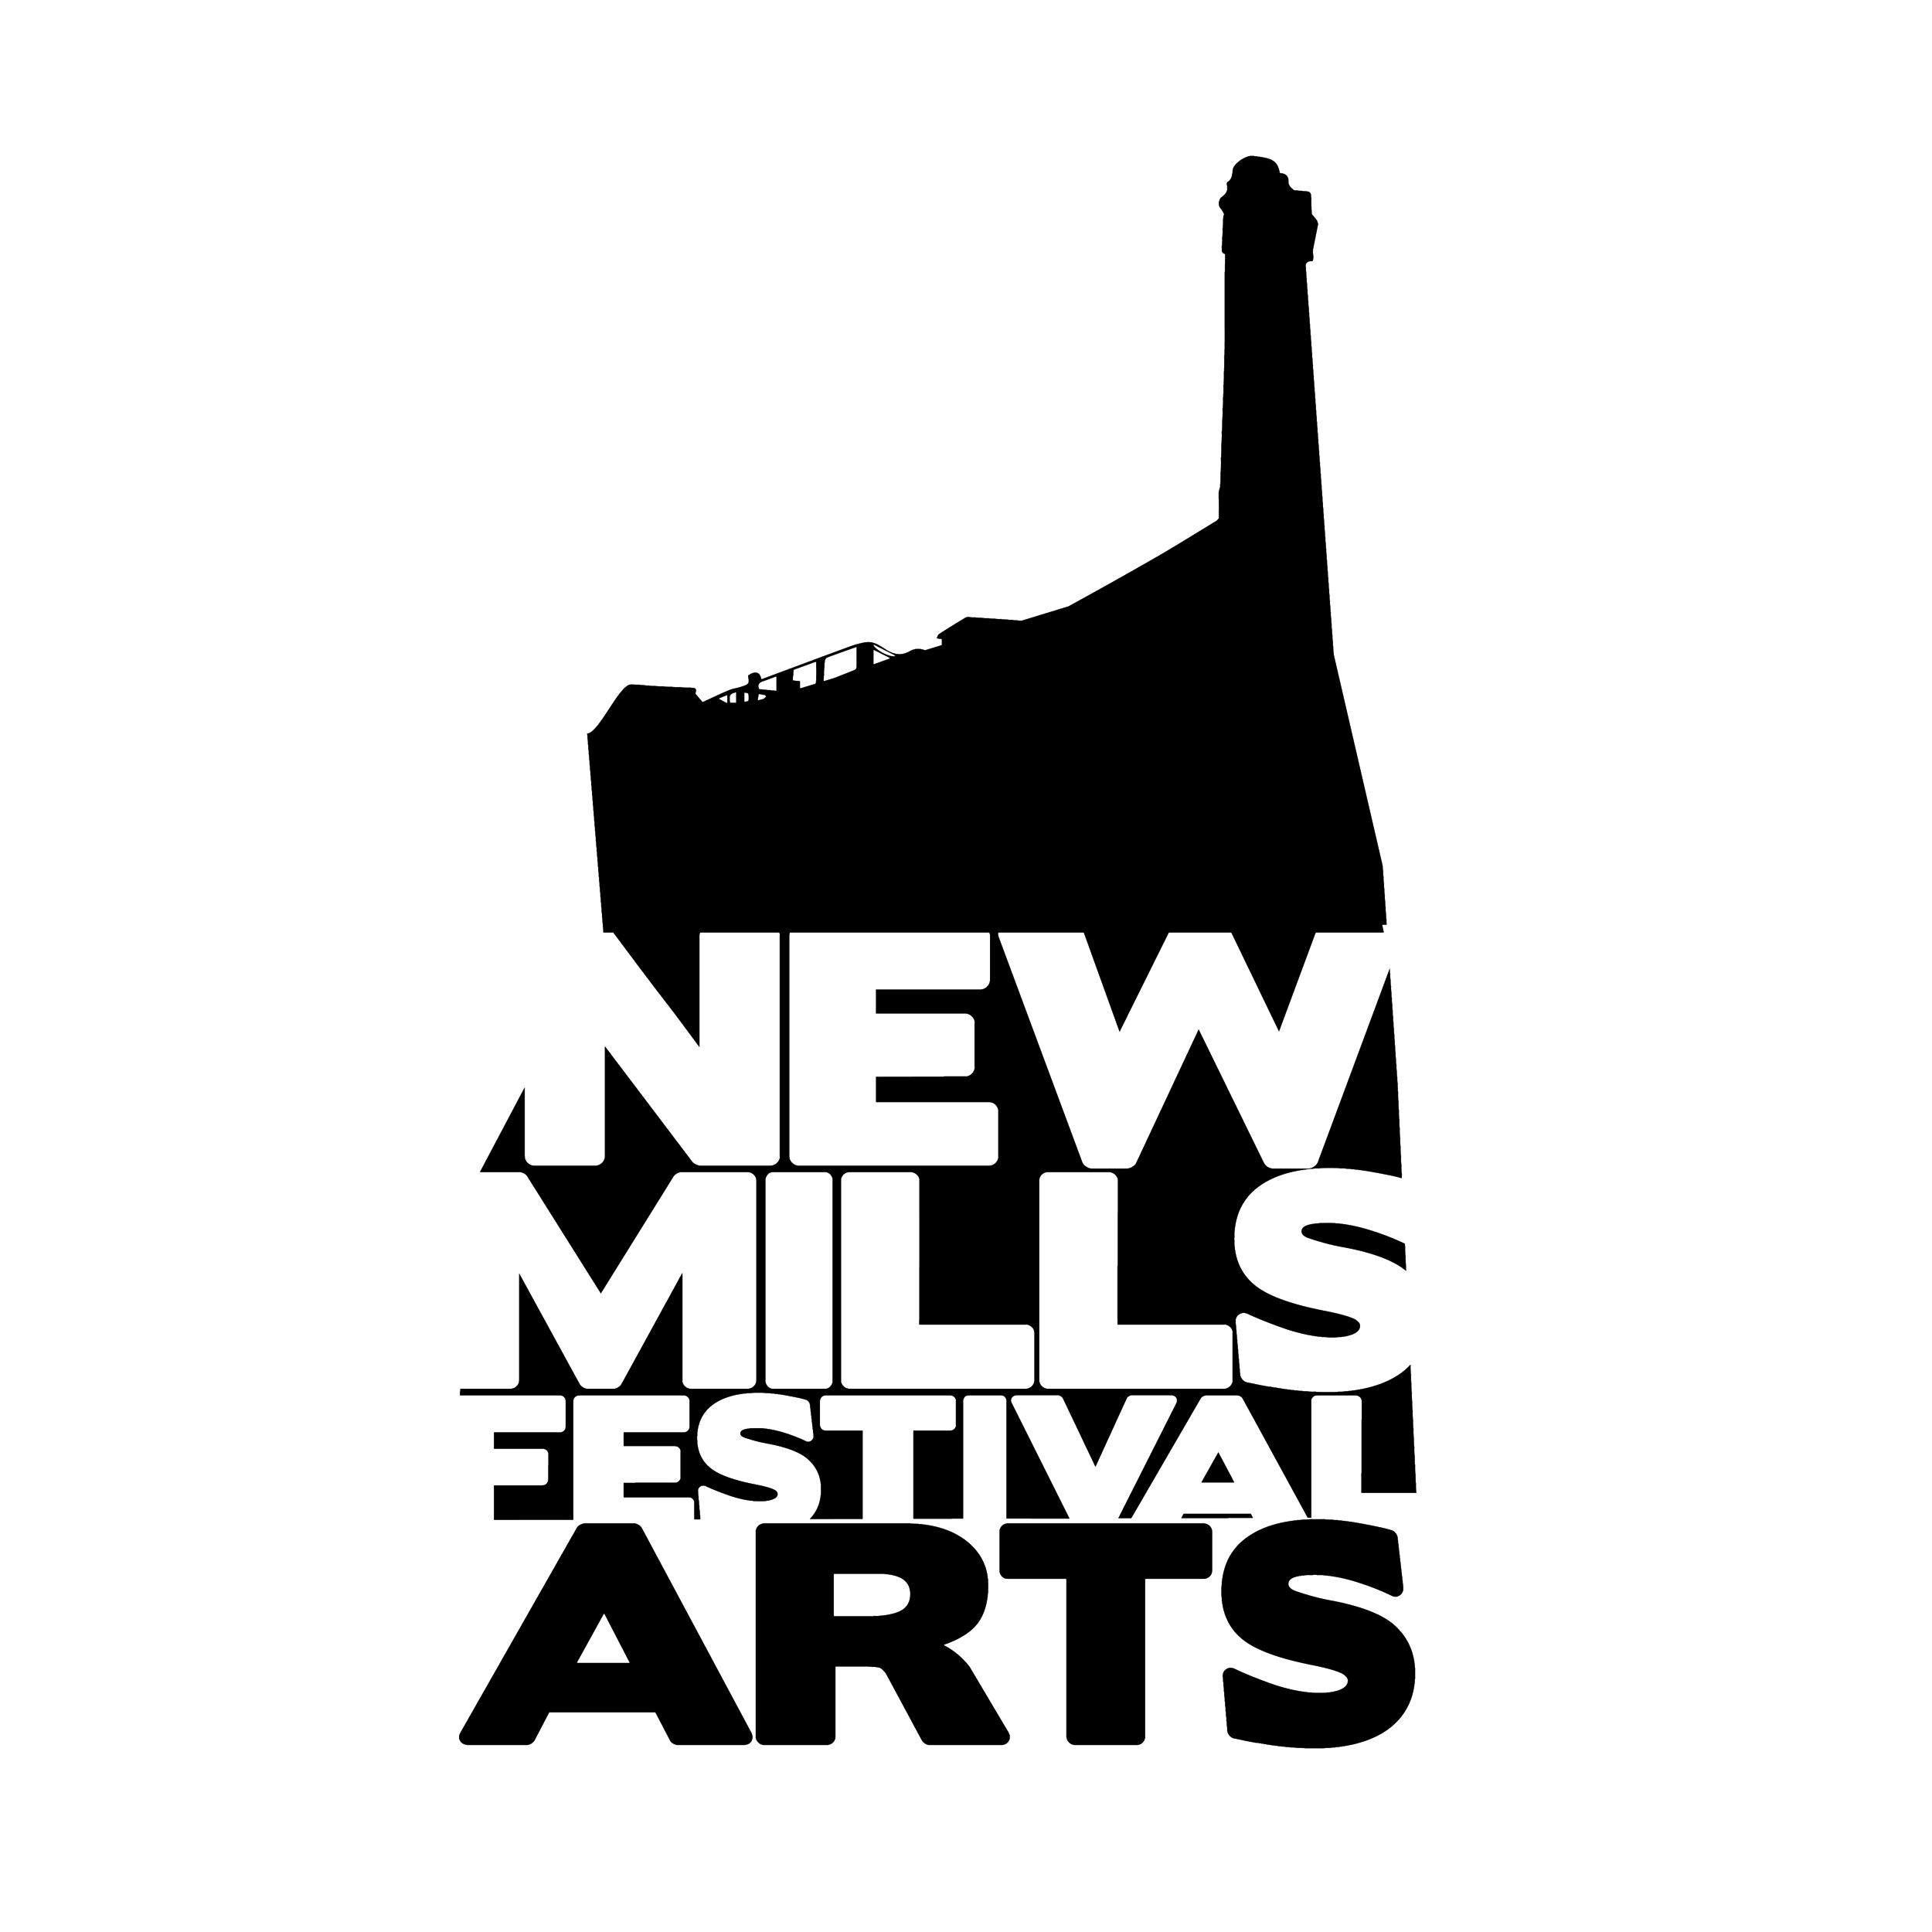 nmfestivalarts transparent background.pdf 4651*4651 px